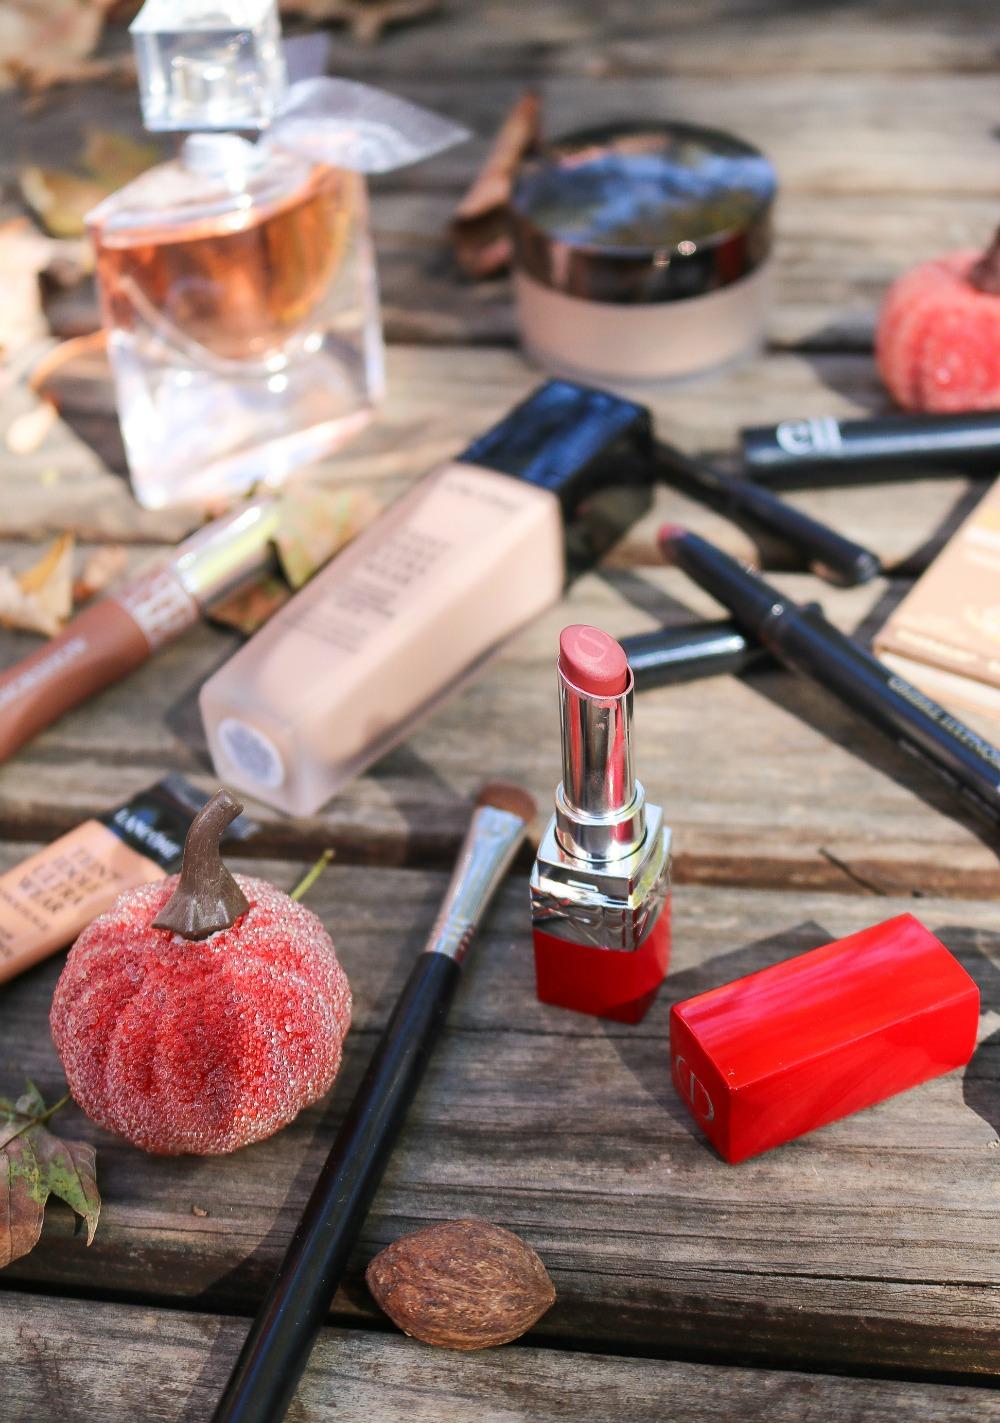 Easy and Fast Fall Makeup Look I Lancome, Dior Makeup and MAC Cosmetics #makeup #beautytips #beautyblog #makeupblog